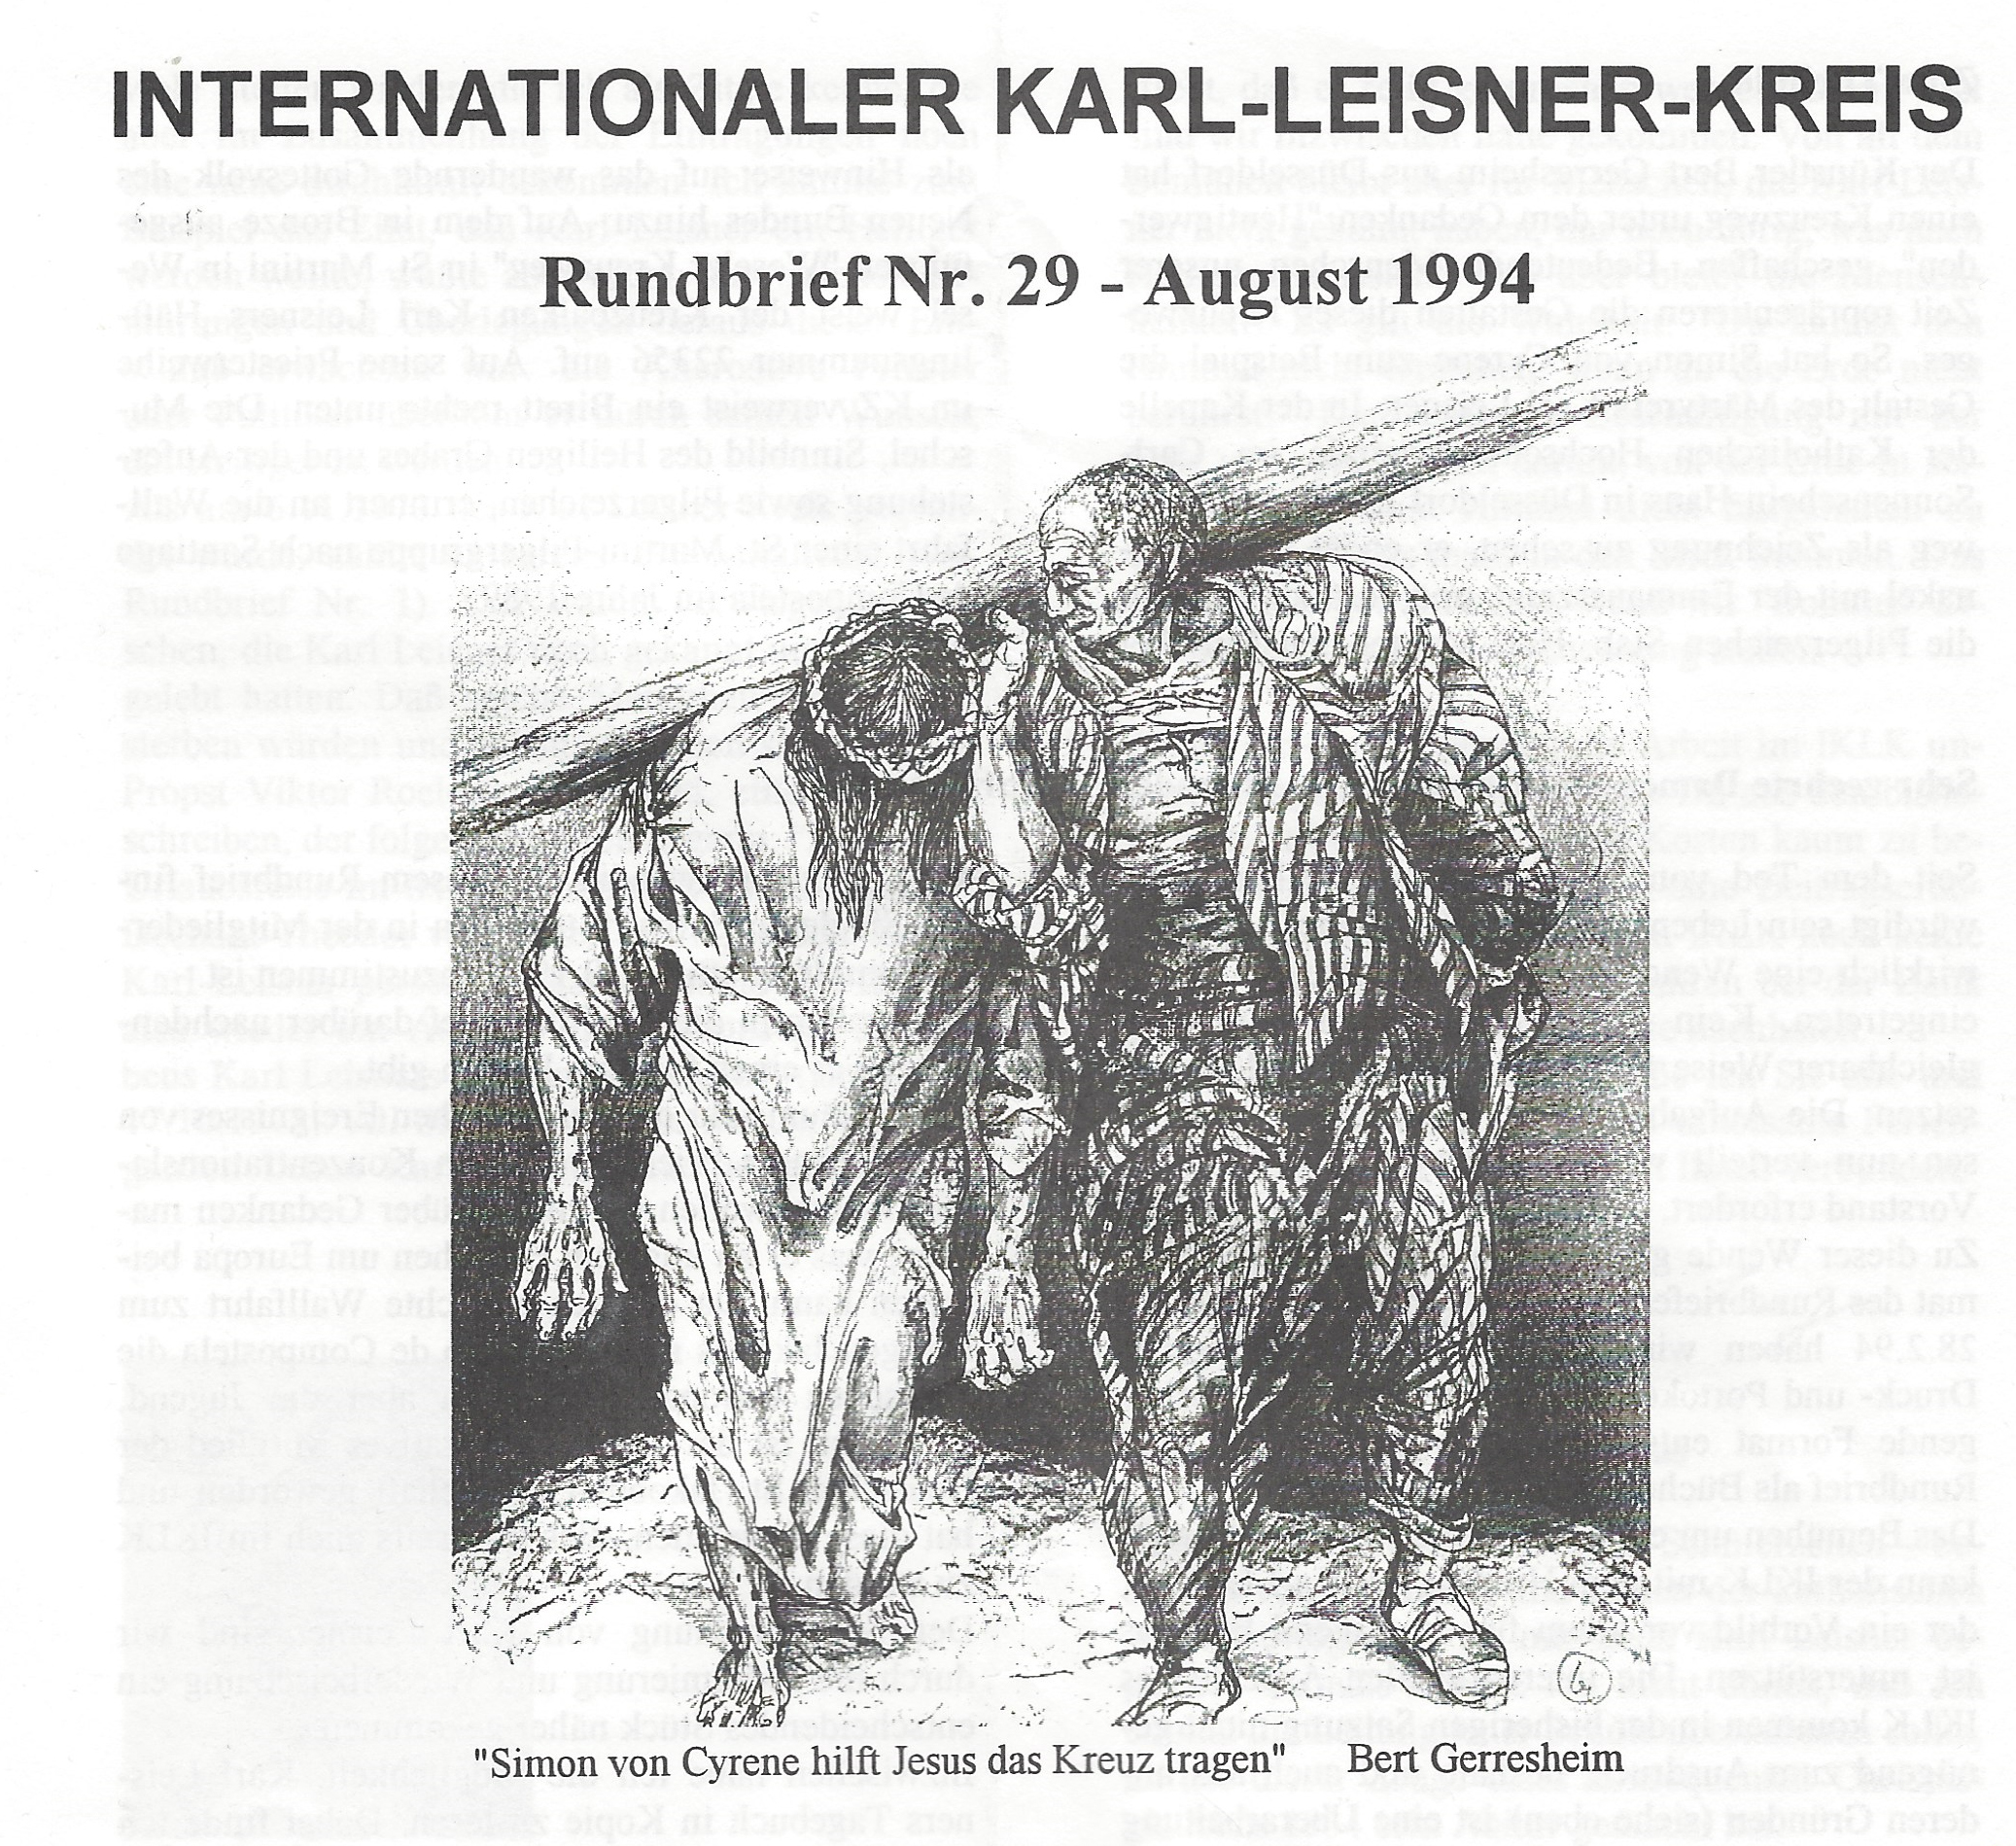 Łagiewniki in Polen: Karl Leisner in der Heilig-Kreuz-Kapelle › IKLK ...